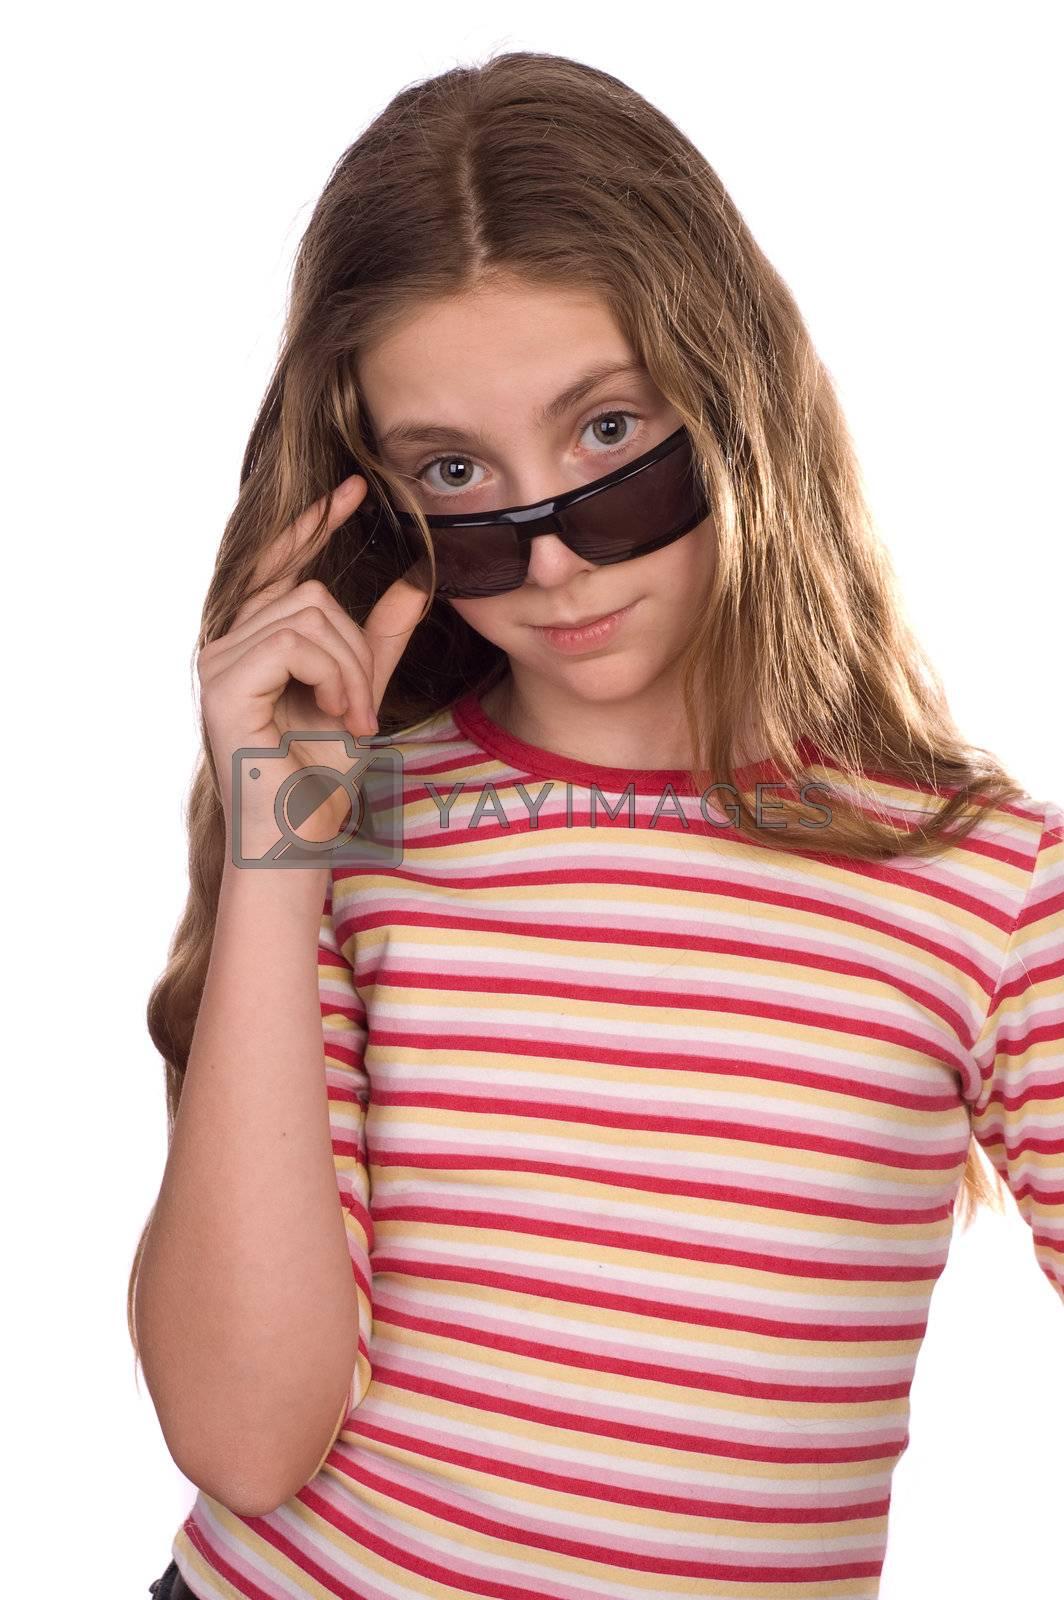 Royalty free image of Teenage girl wearing sunglasses isolated on white by iribo